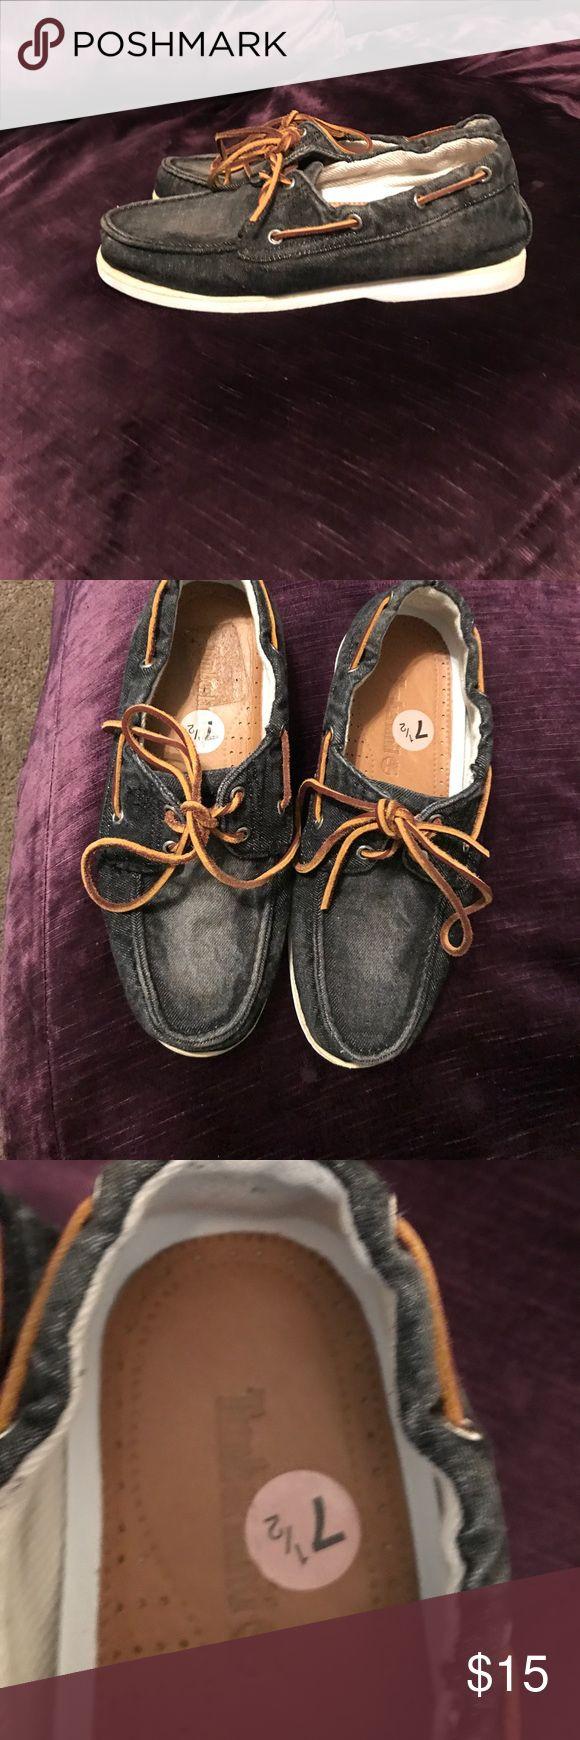 Denim Timberland shoes Boy's/Men Denim Timberland shoes Timberland Shoes Loafers & Slip-Ons